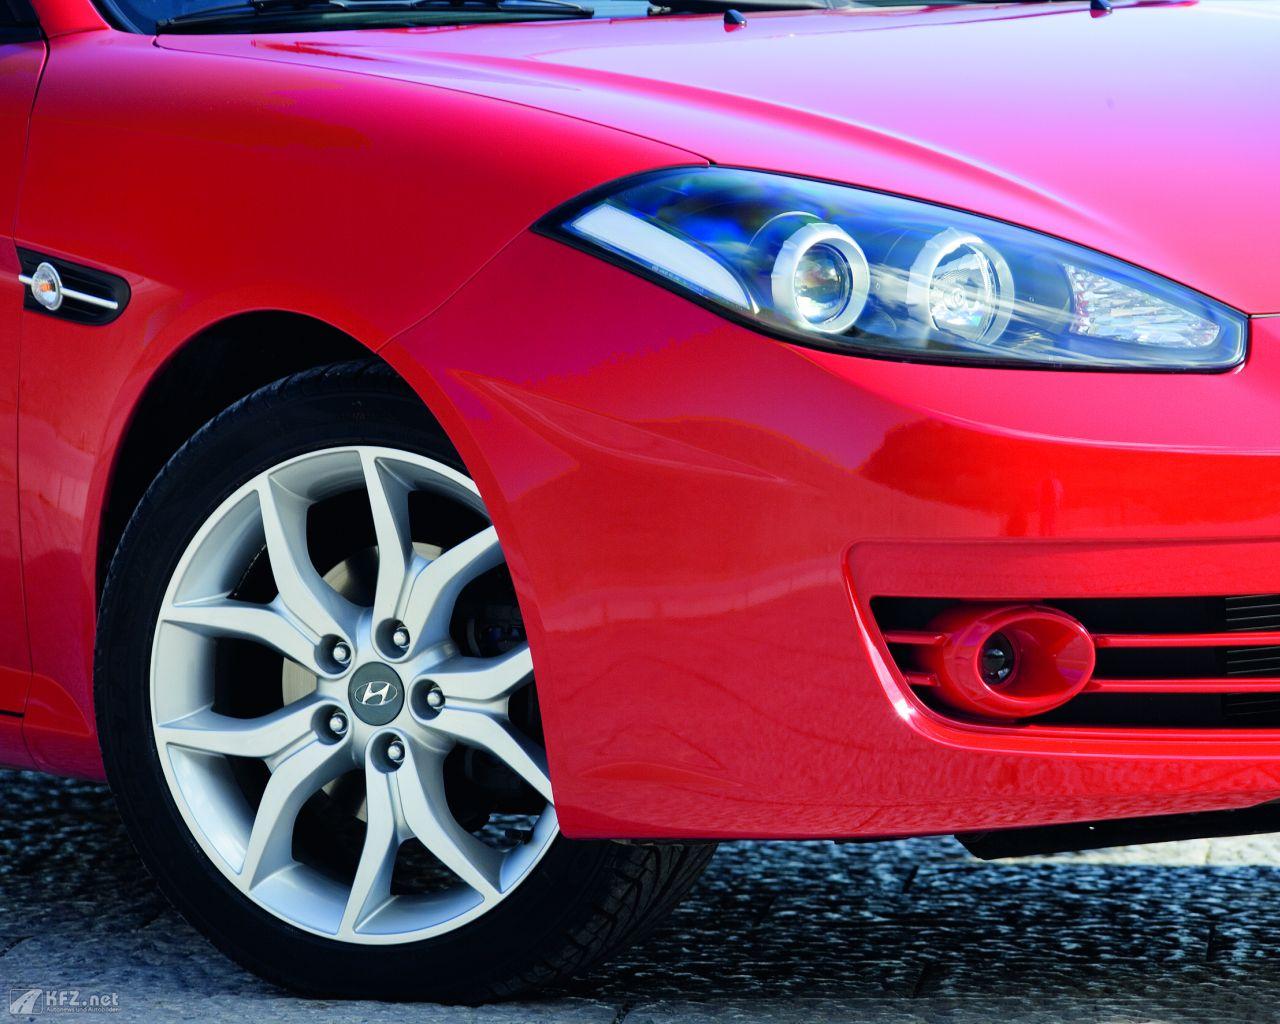 hyundai-coupe-1280x1024-171